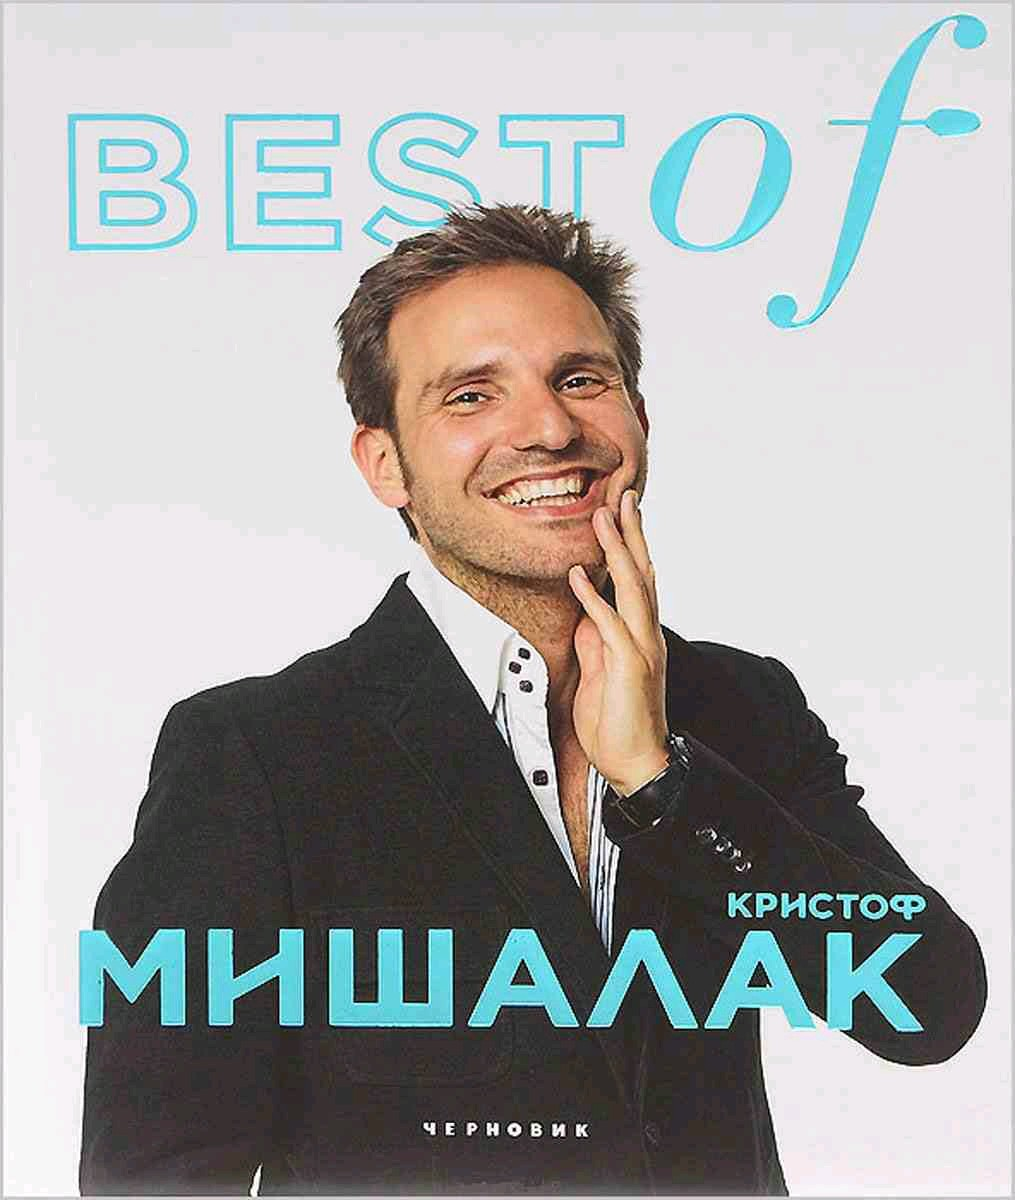 BEST of Кристоф Мишалак